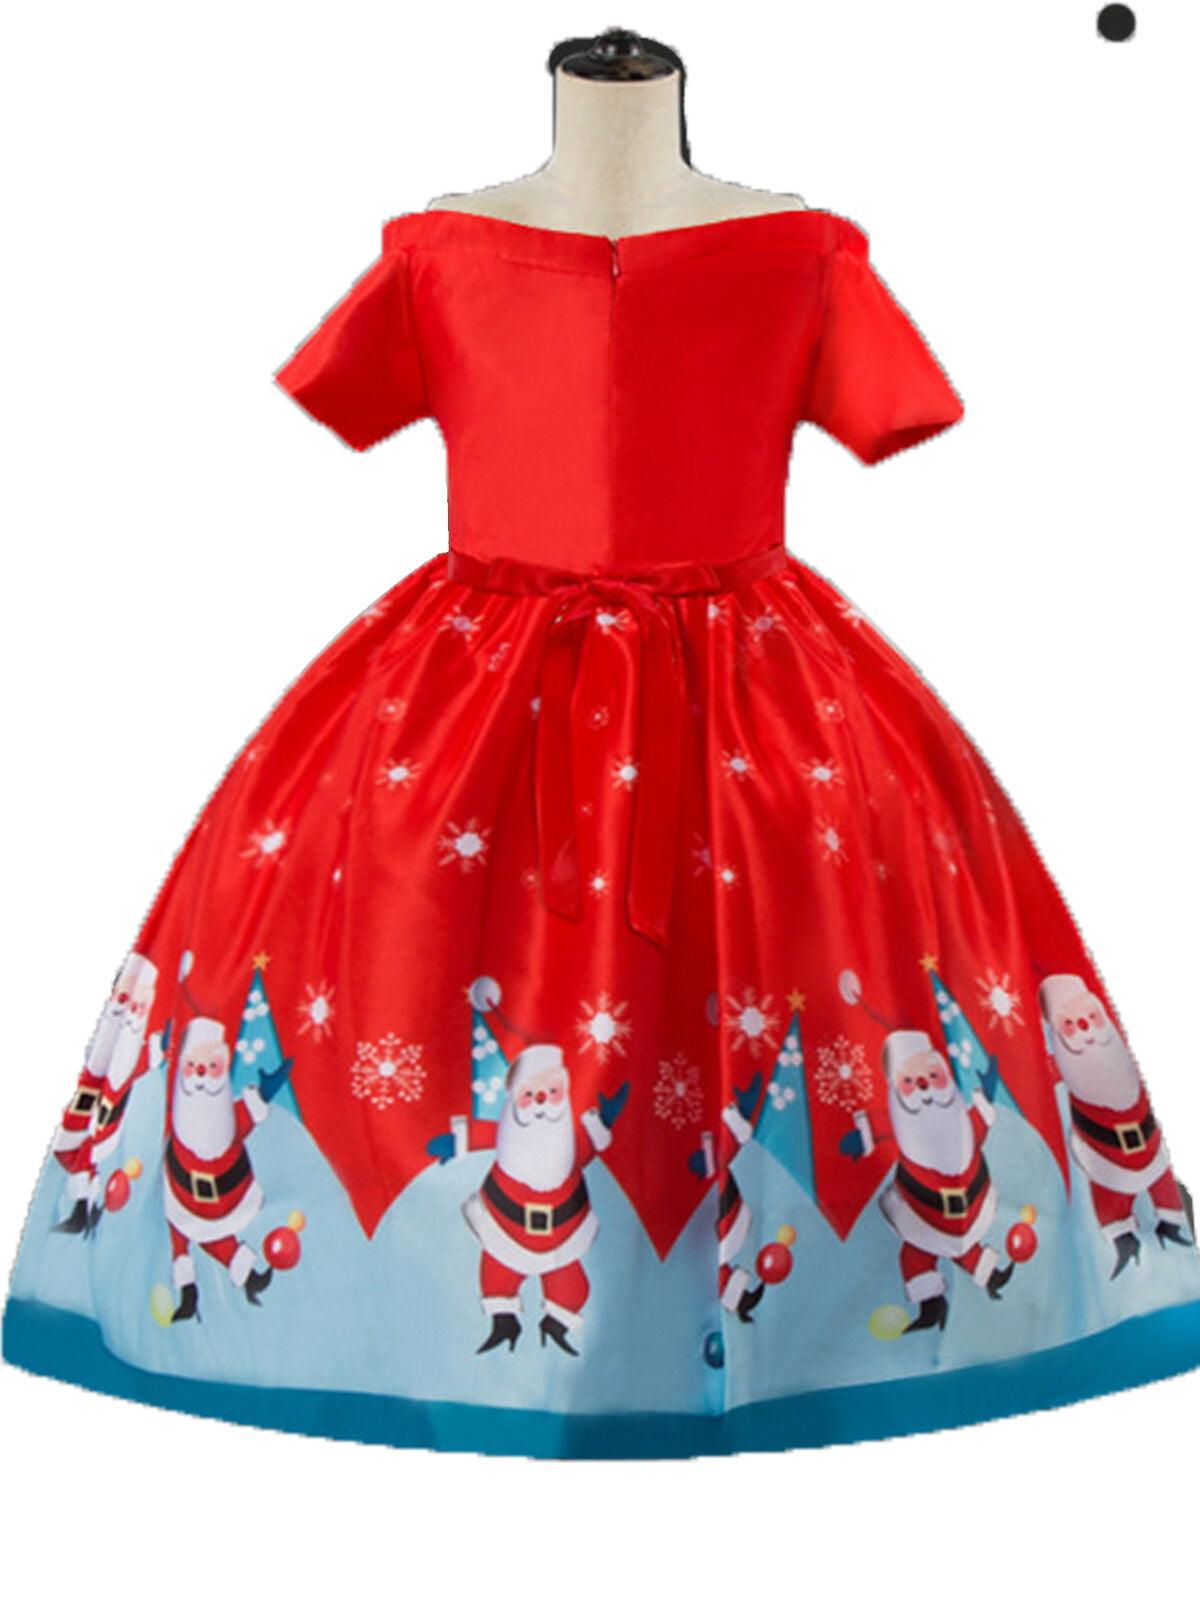 Christmas Dress Floral Baby Dress Winter Floral Dress Newborn Dress Vintage Christmas Dress Santa Picture Dress Christmas Baby Dress